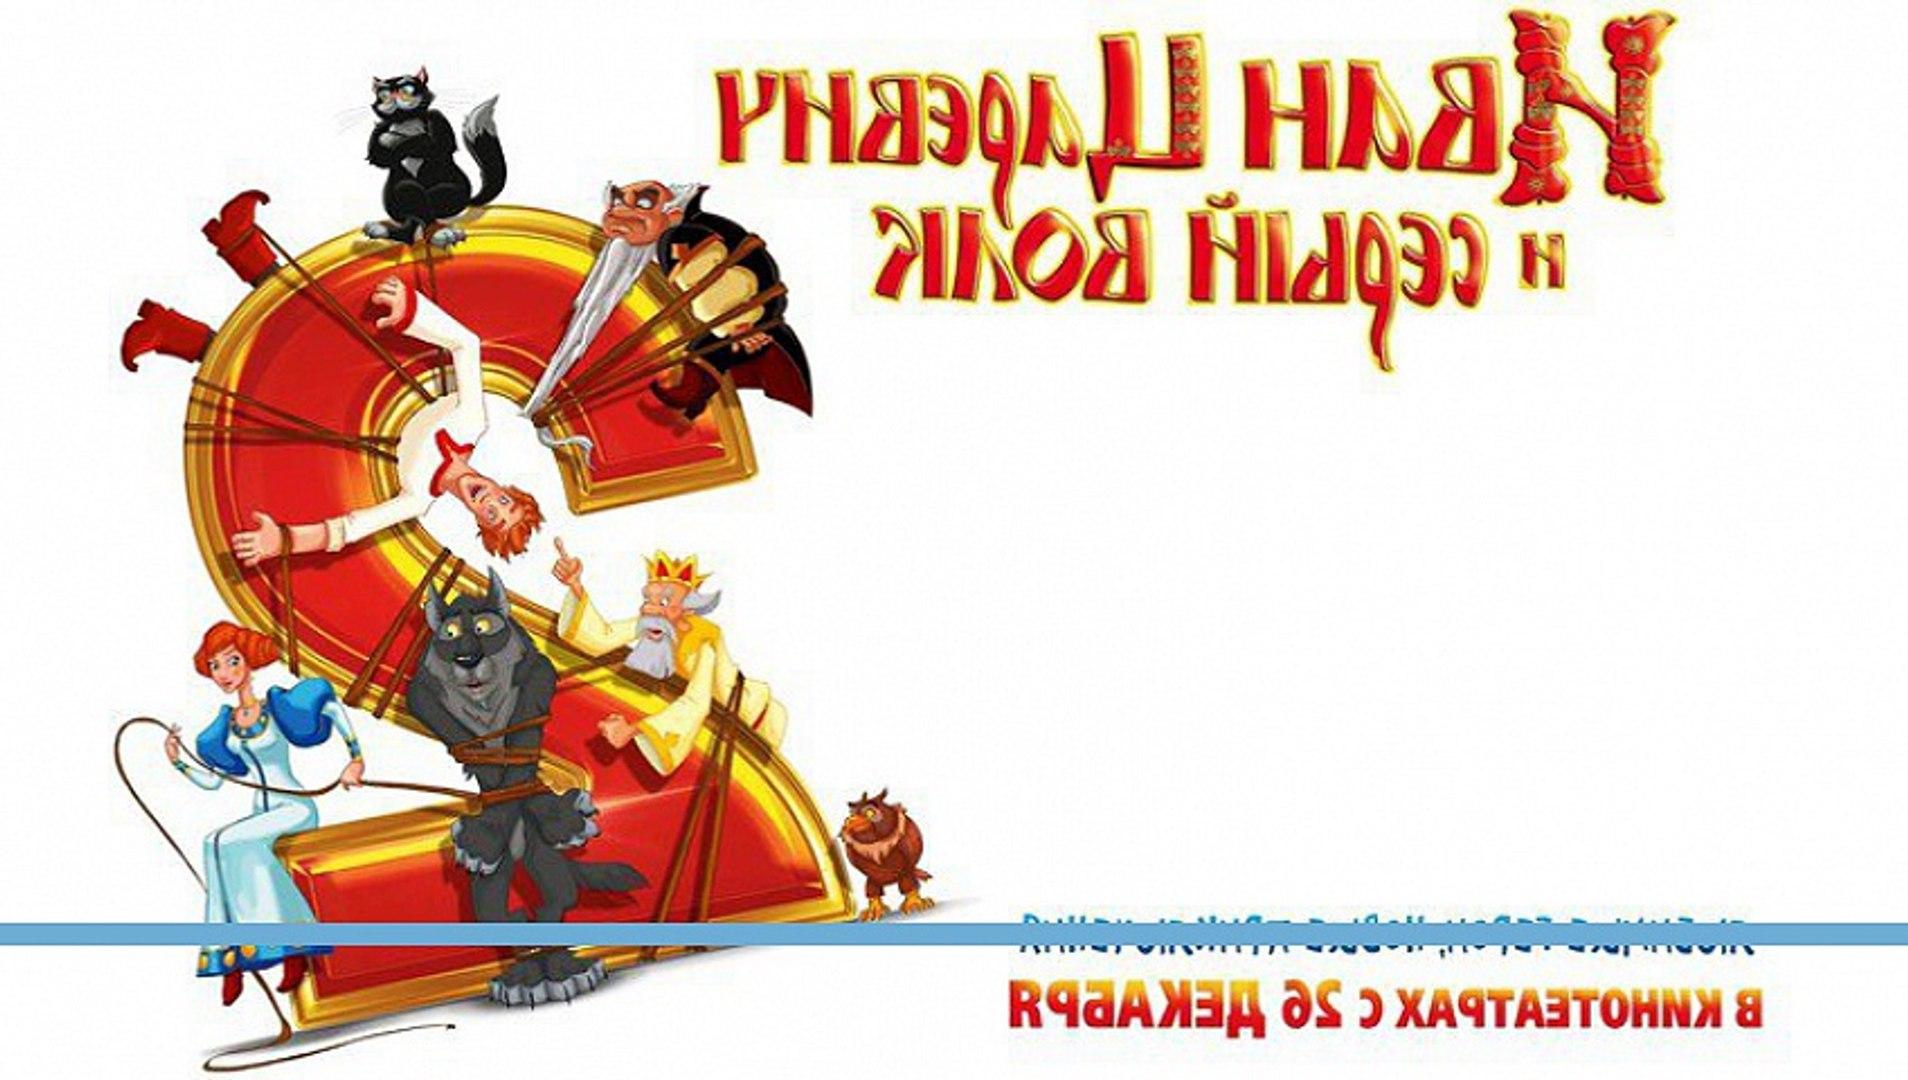 Иван Царевич и Серый Волк 2  [Full] Streaming  2013  Part2